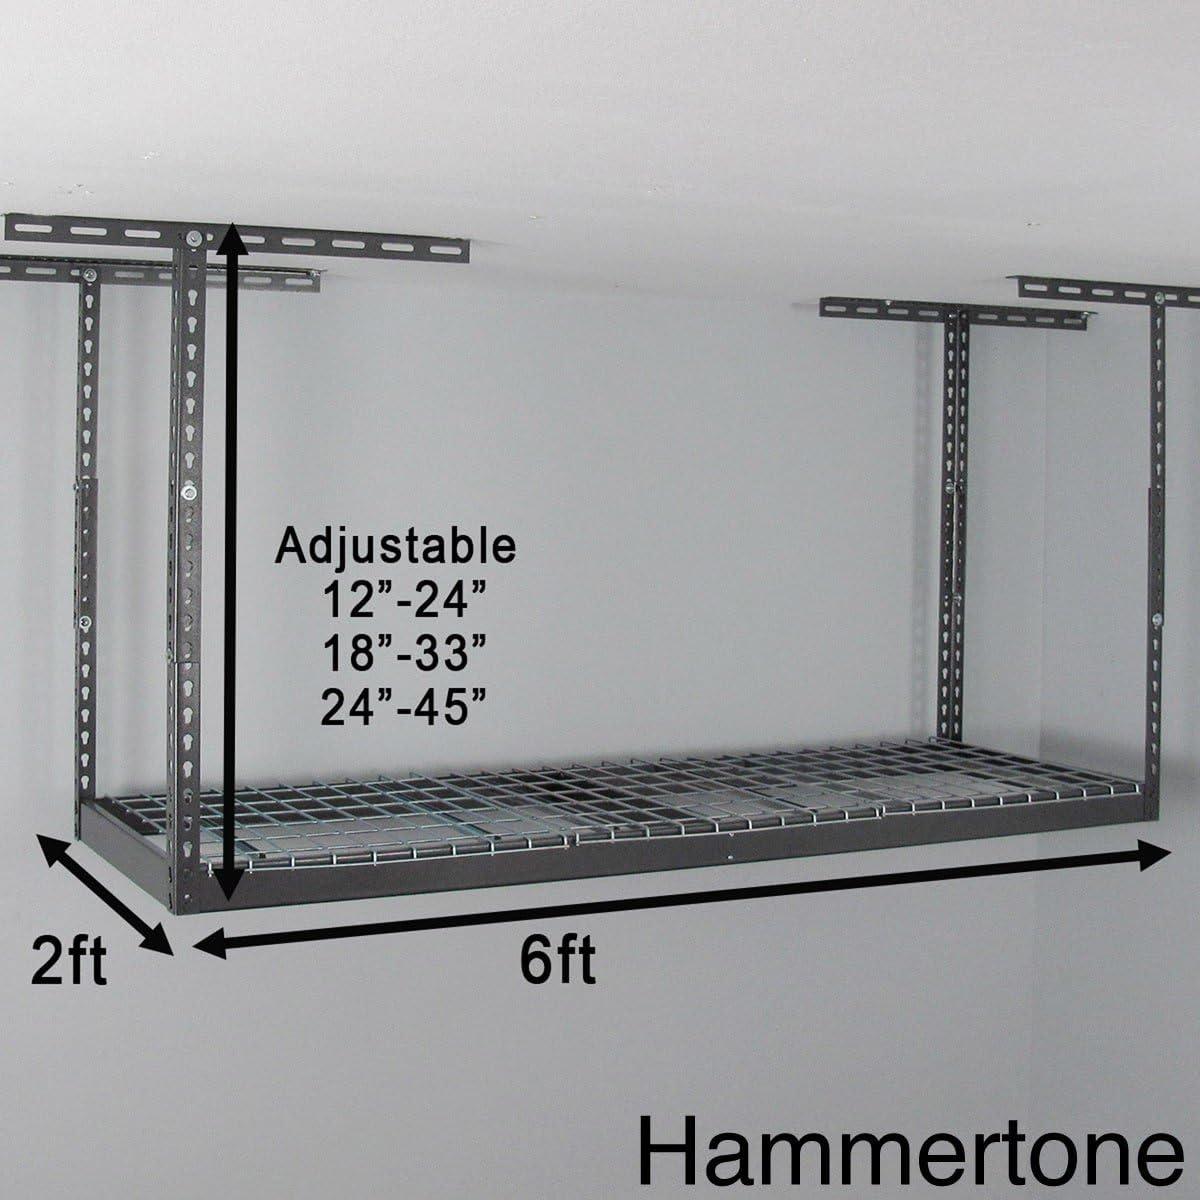 MonsterRax 2 x 6 Overhead Garage Storage Rack Grey 45